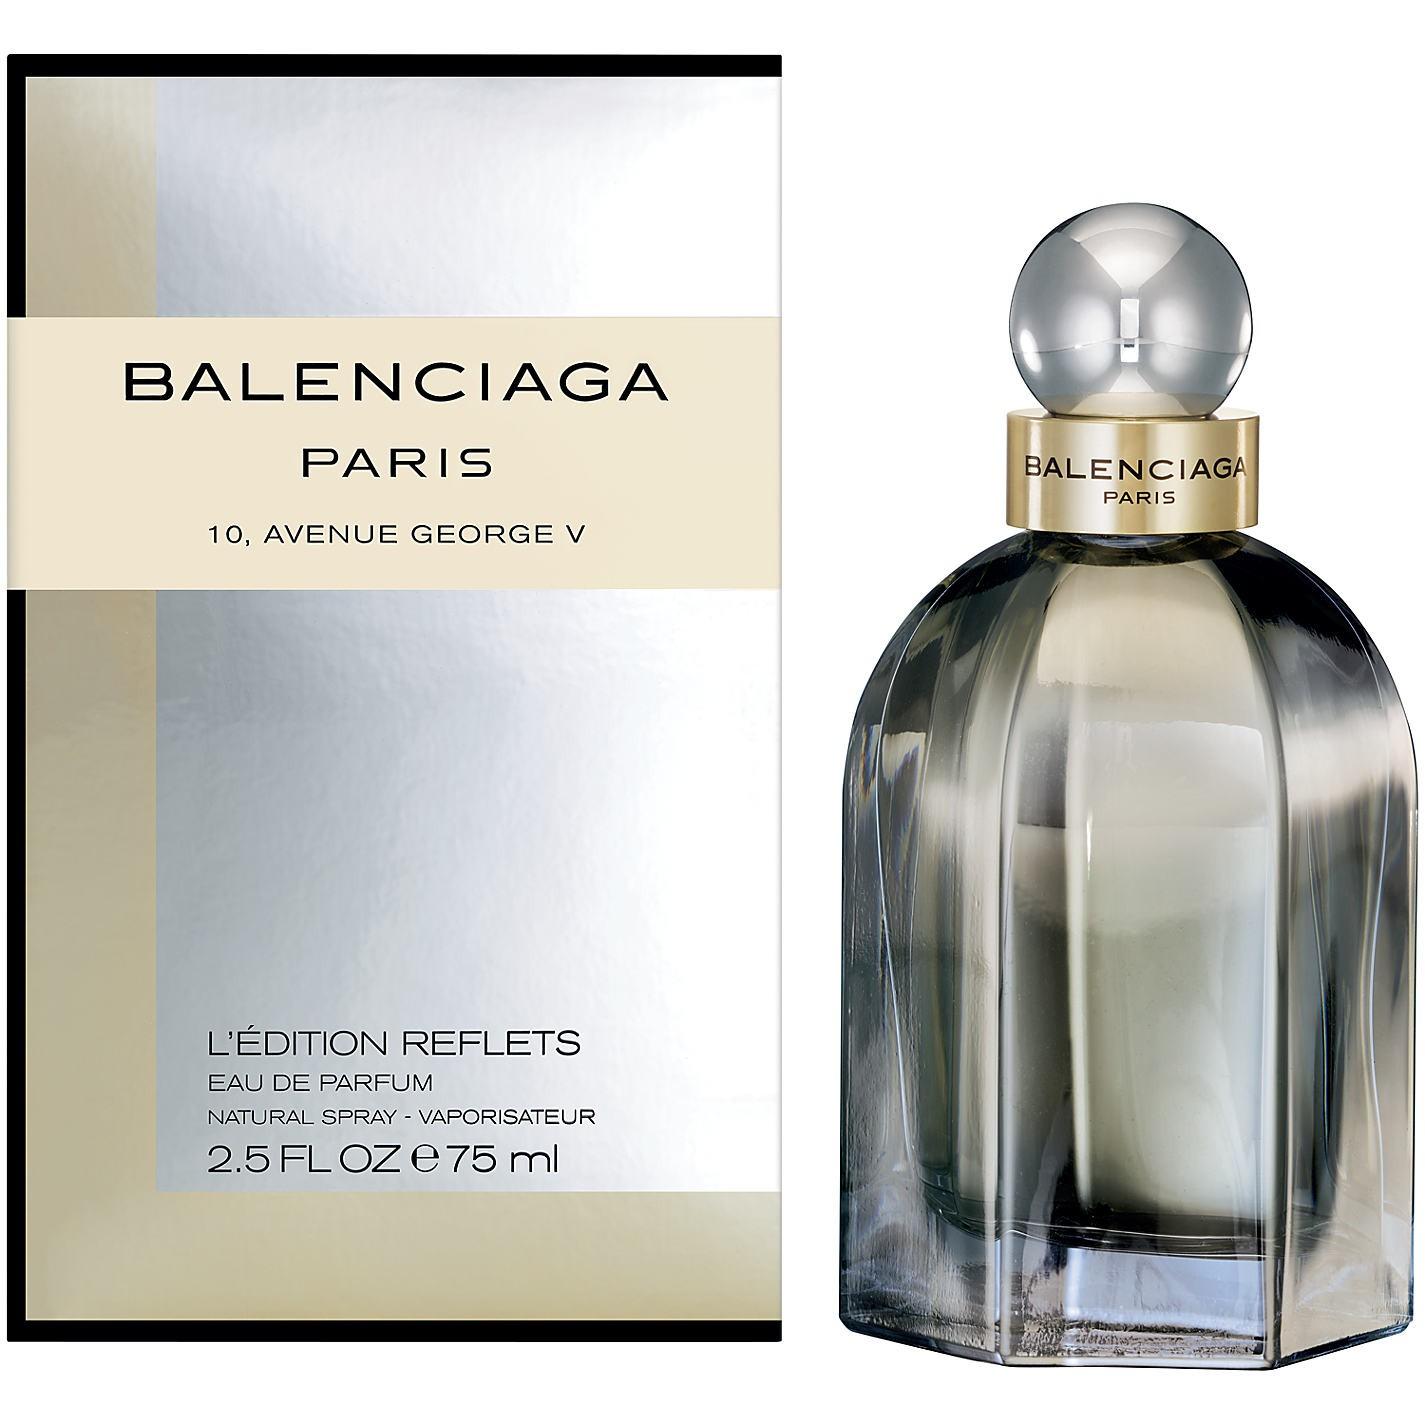 Balenciaga Paris L'Édition Reflets аромат для женщин